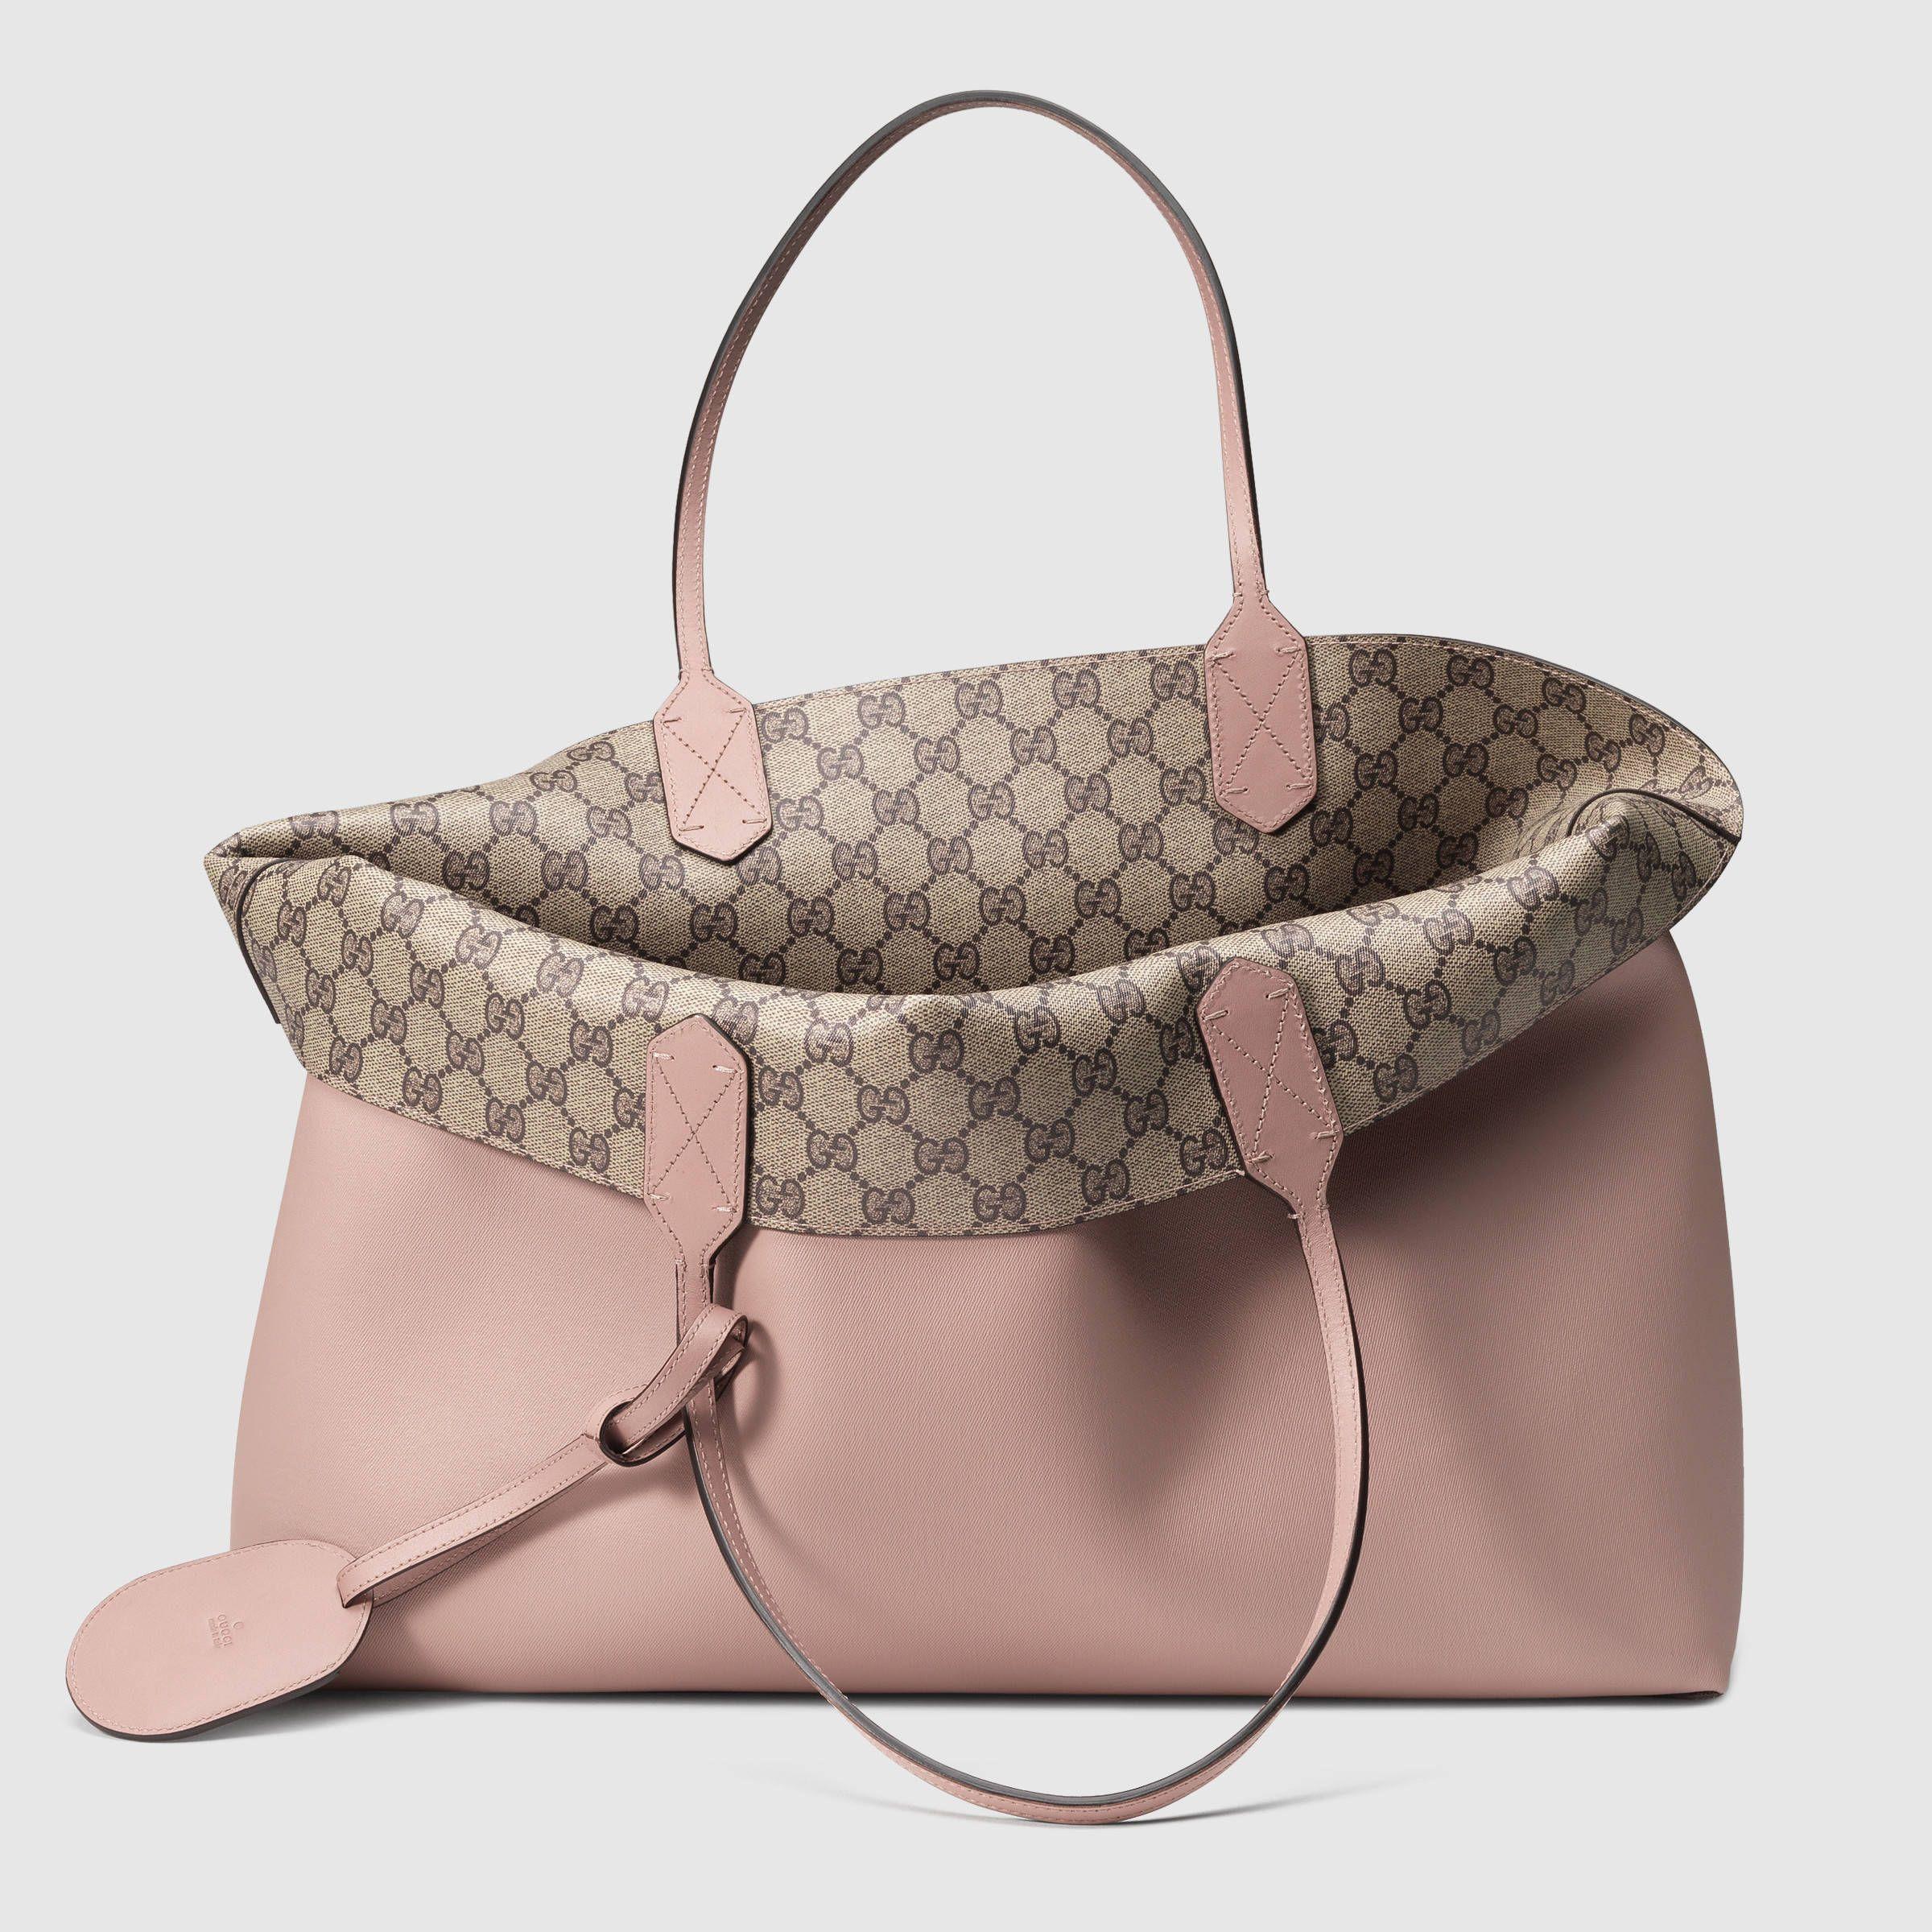 ee0ac5d77 ... purses cheap designer handbags, storing handbags. Gucci Women -  Reversible GG leather tote - $1,250